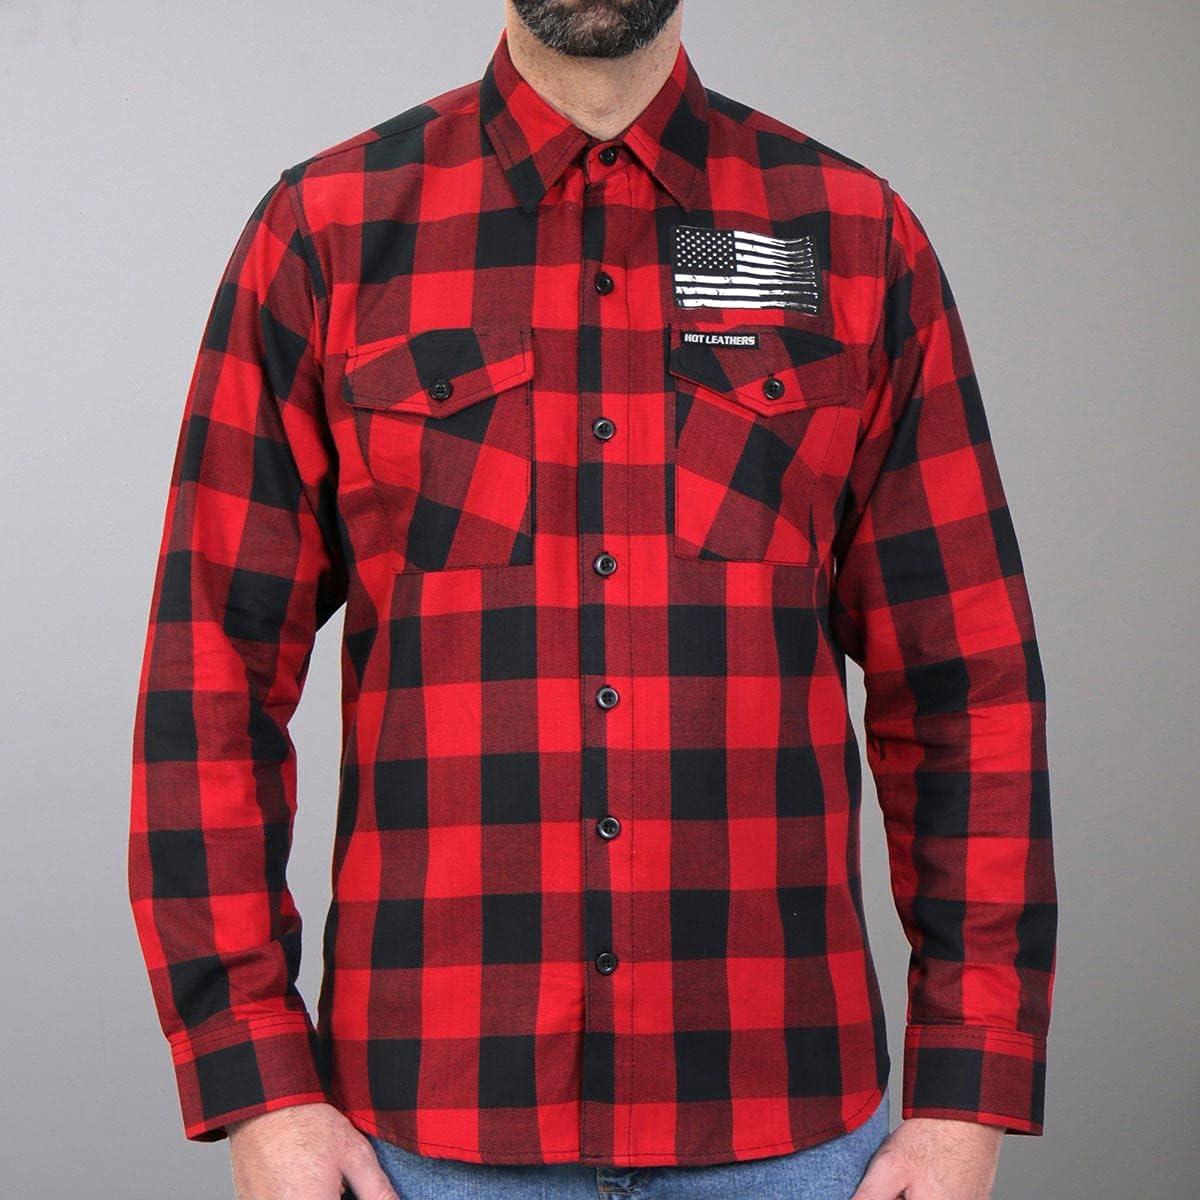 Hot Leathers FLM2110 Men's 'Bullets' Flannel Long Sleeve Shirt